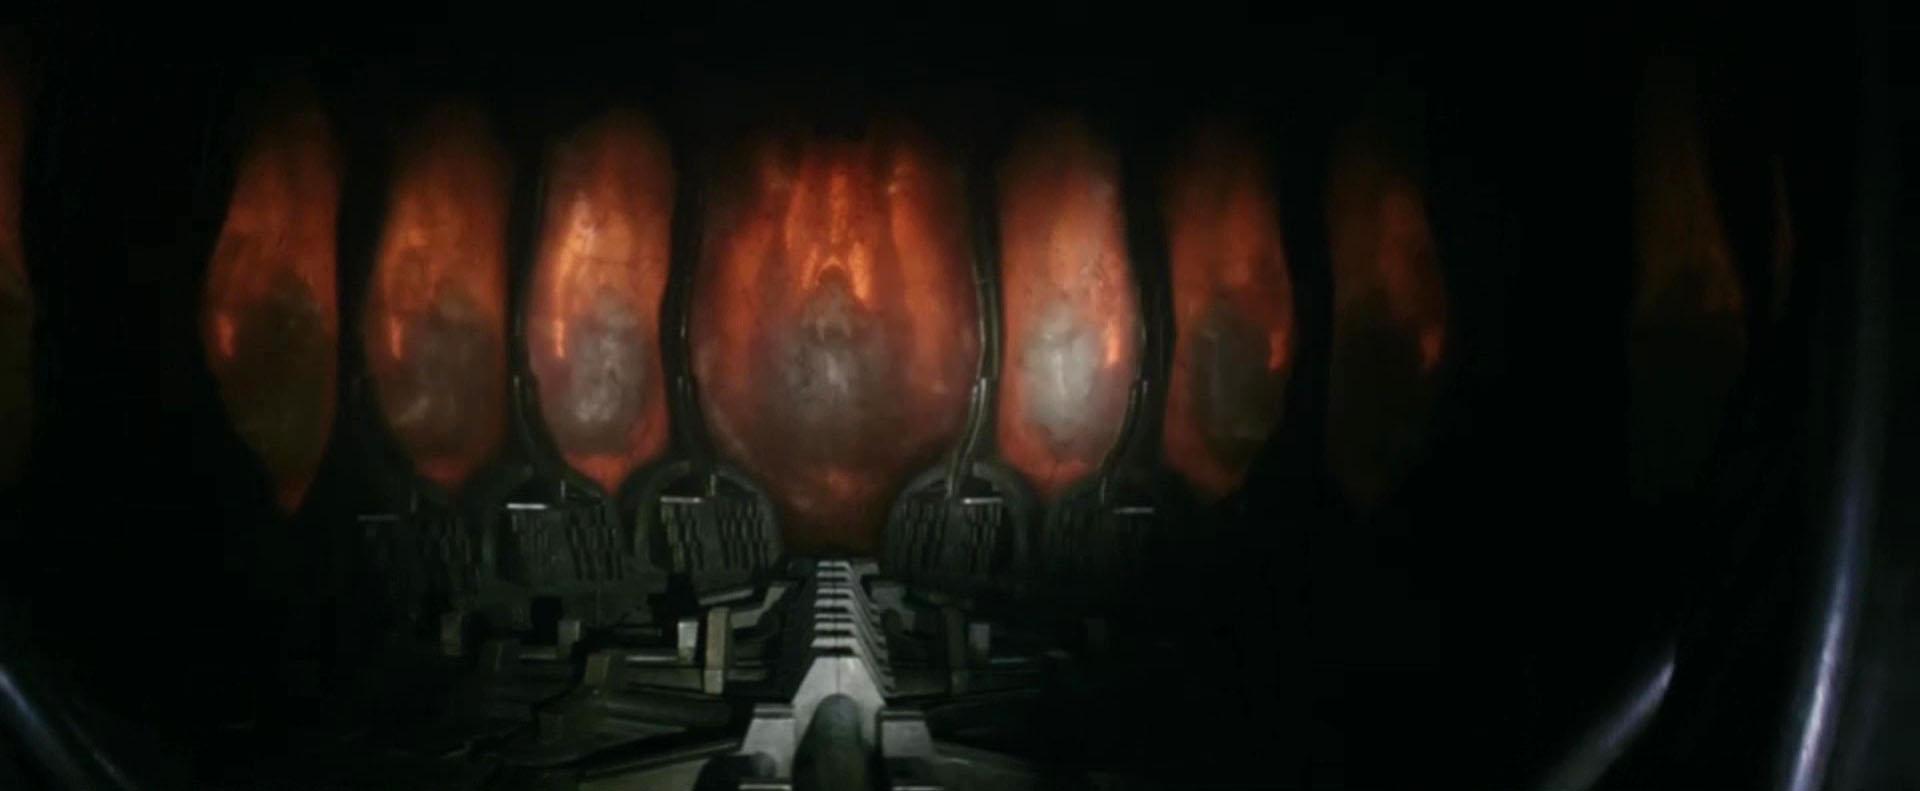 Citazioni aliene. Tomorrow War (2021)